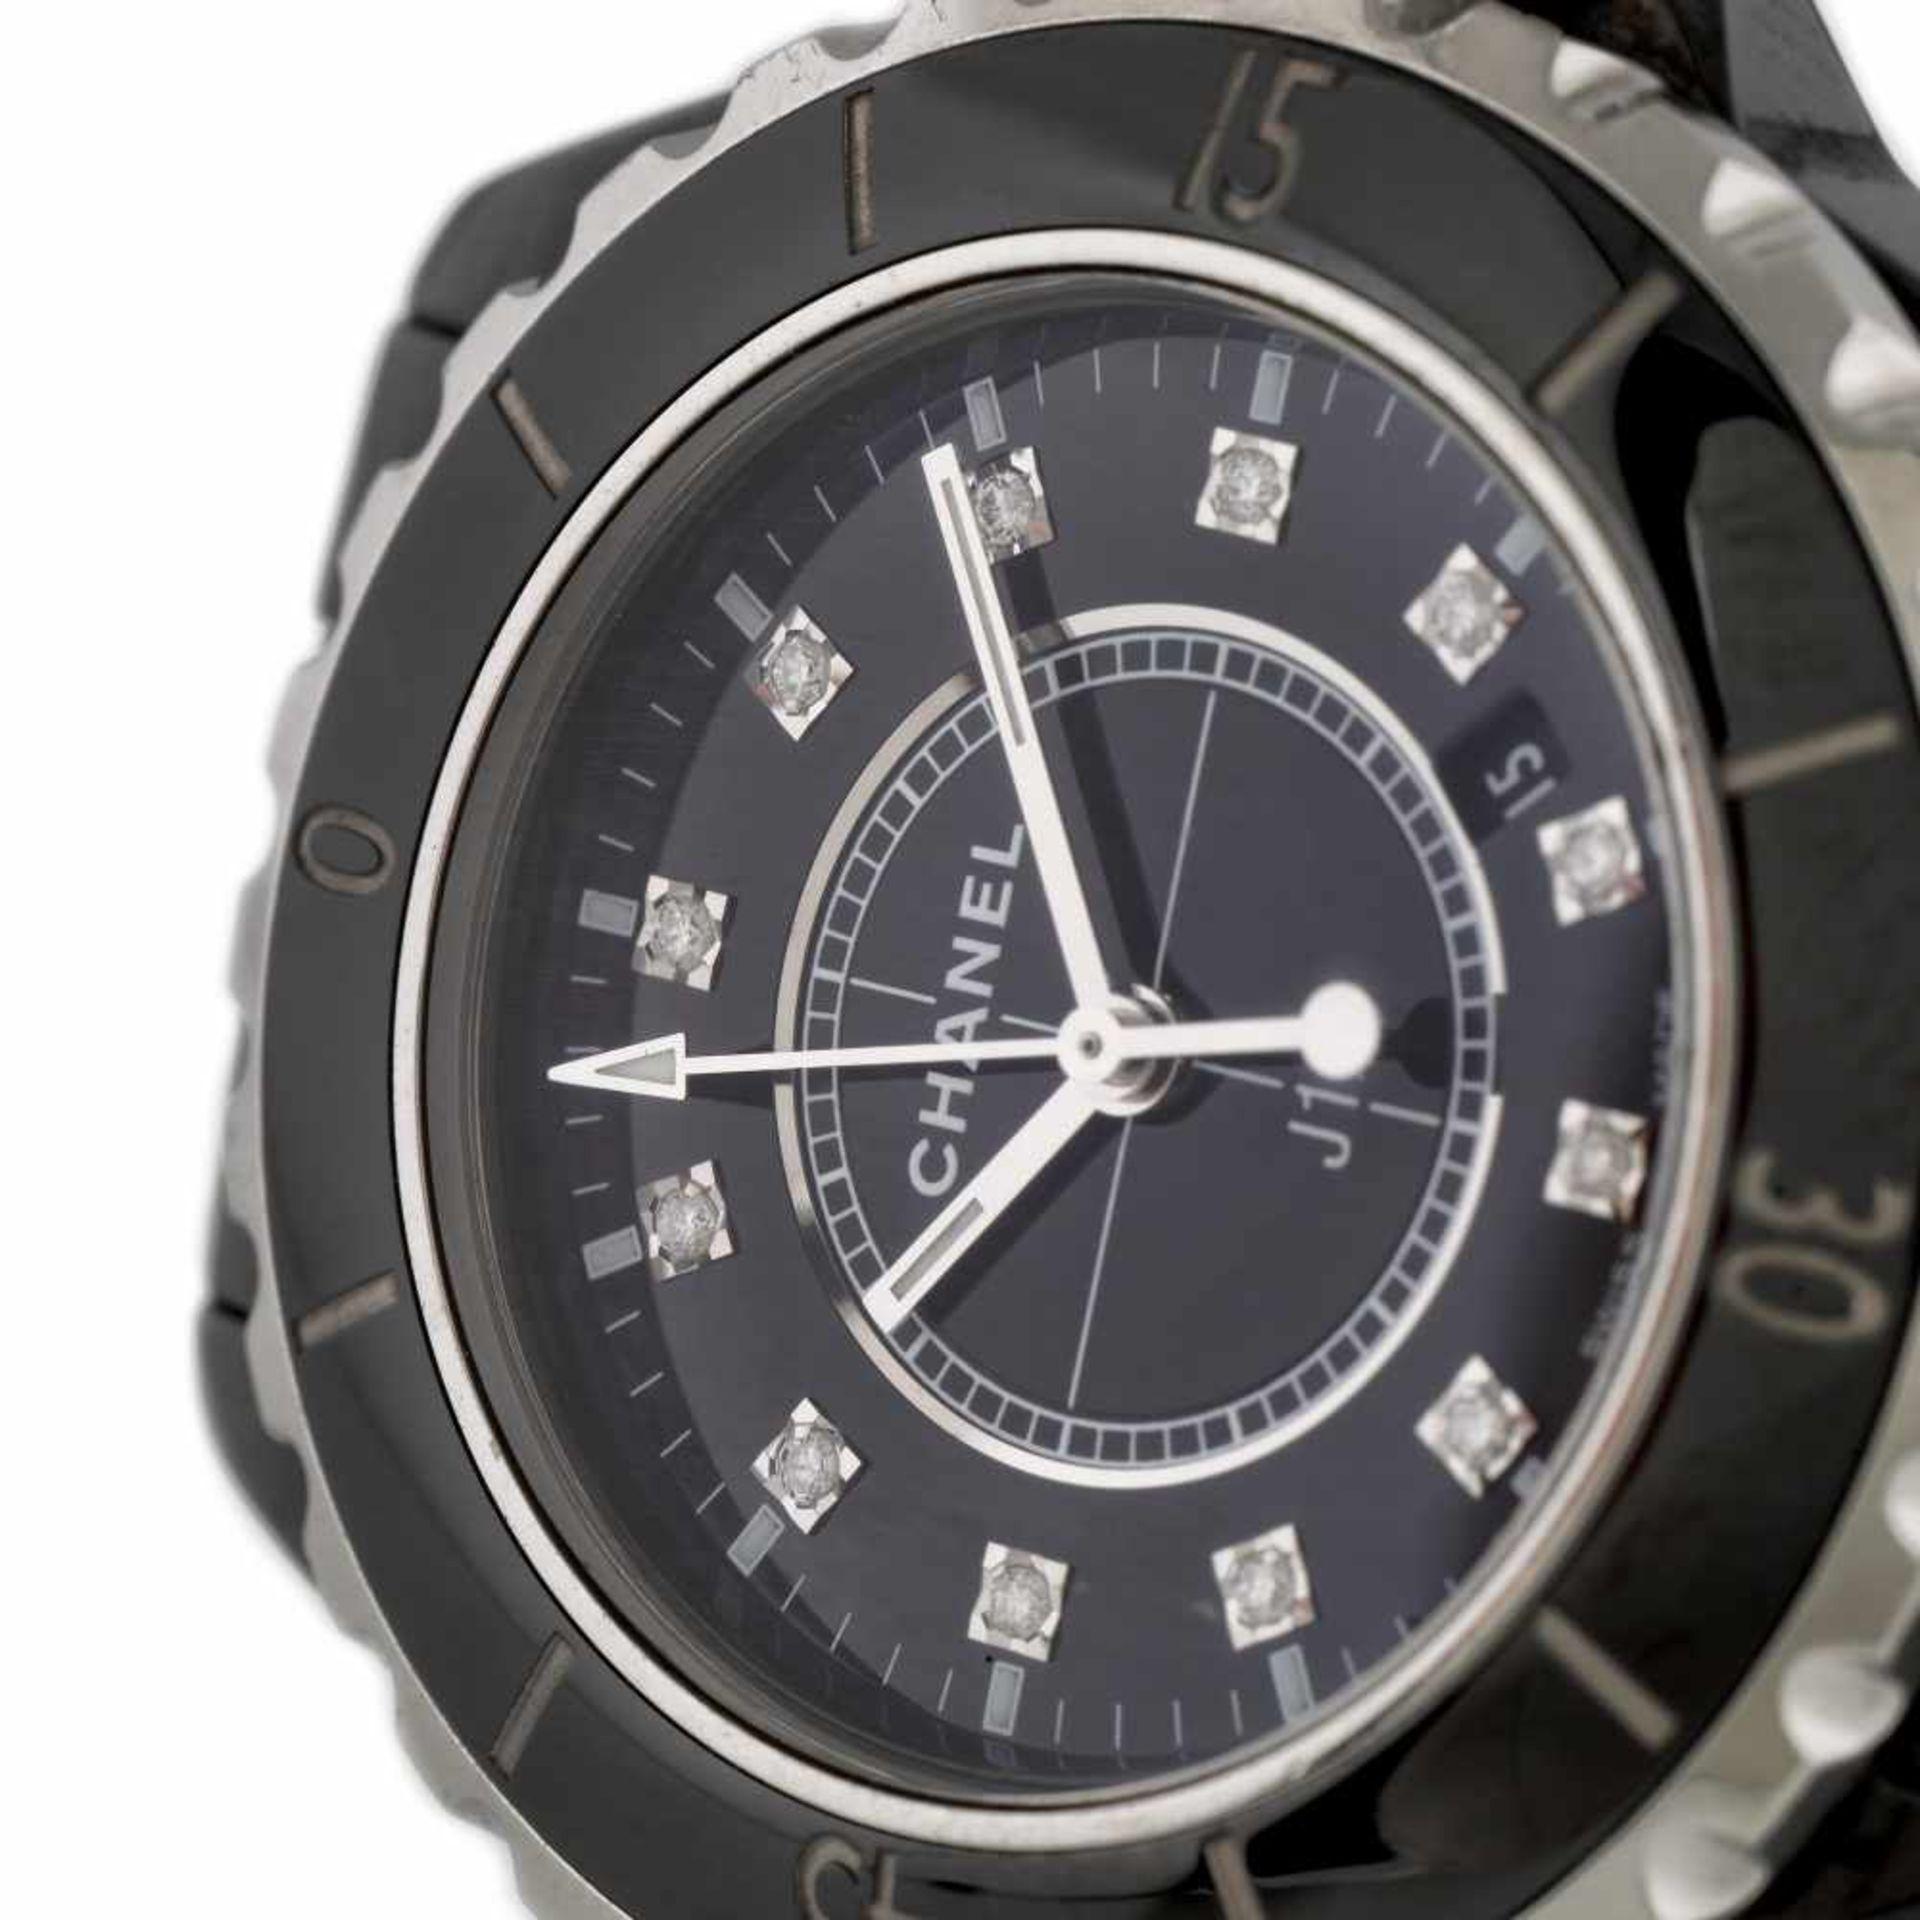 Chanel bracelet watch, women, decorated with diamonds - Bild 2 aus 3